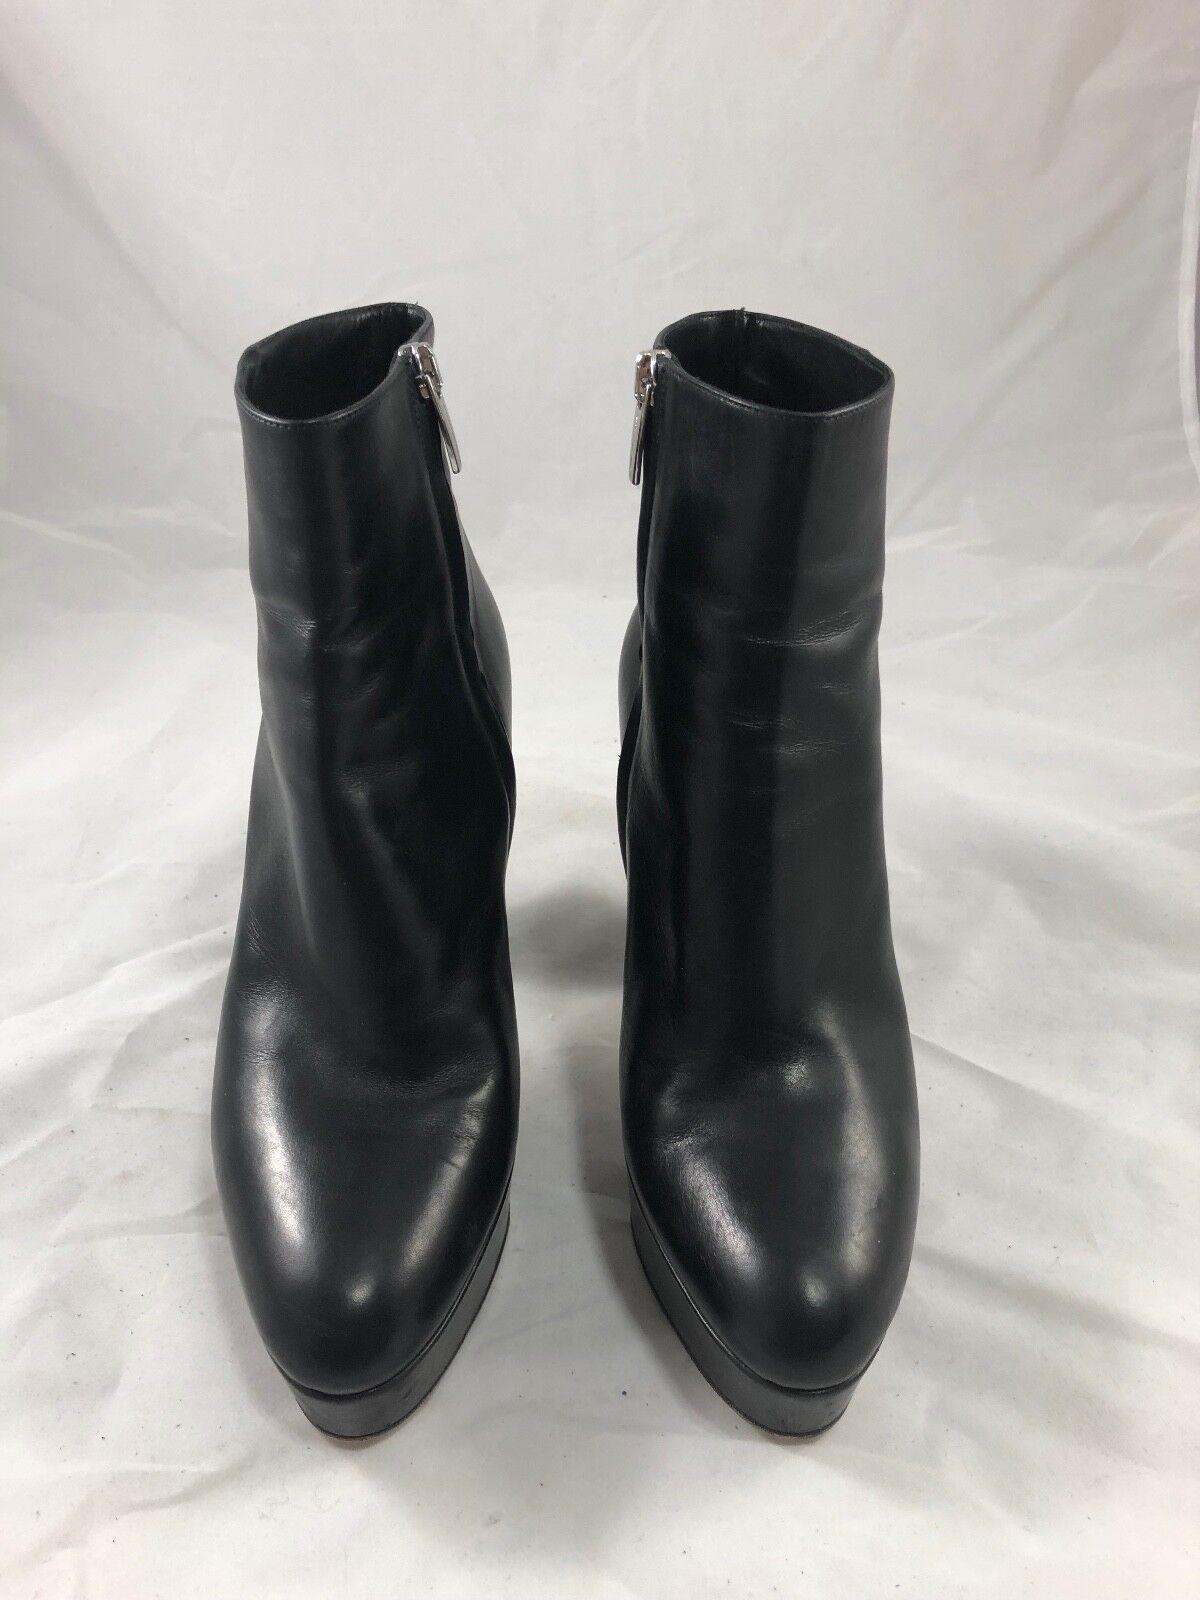 Gianvito Rossi Temple Leather Platform Ankle Boots in Black Black Black Size 38.5 e7d64e